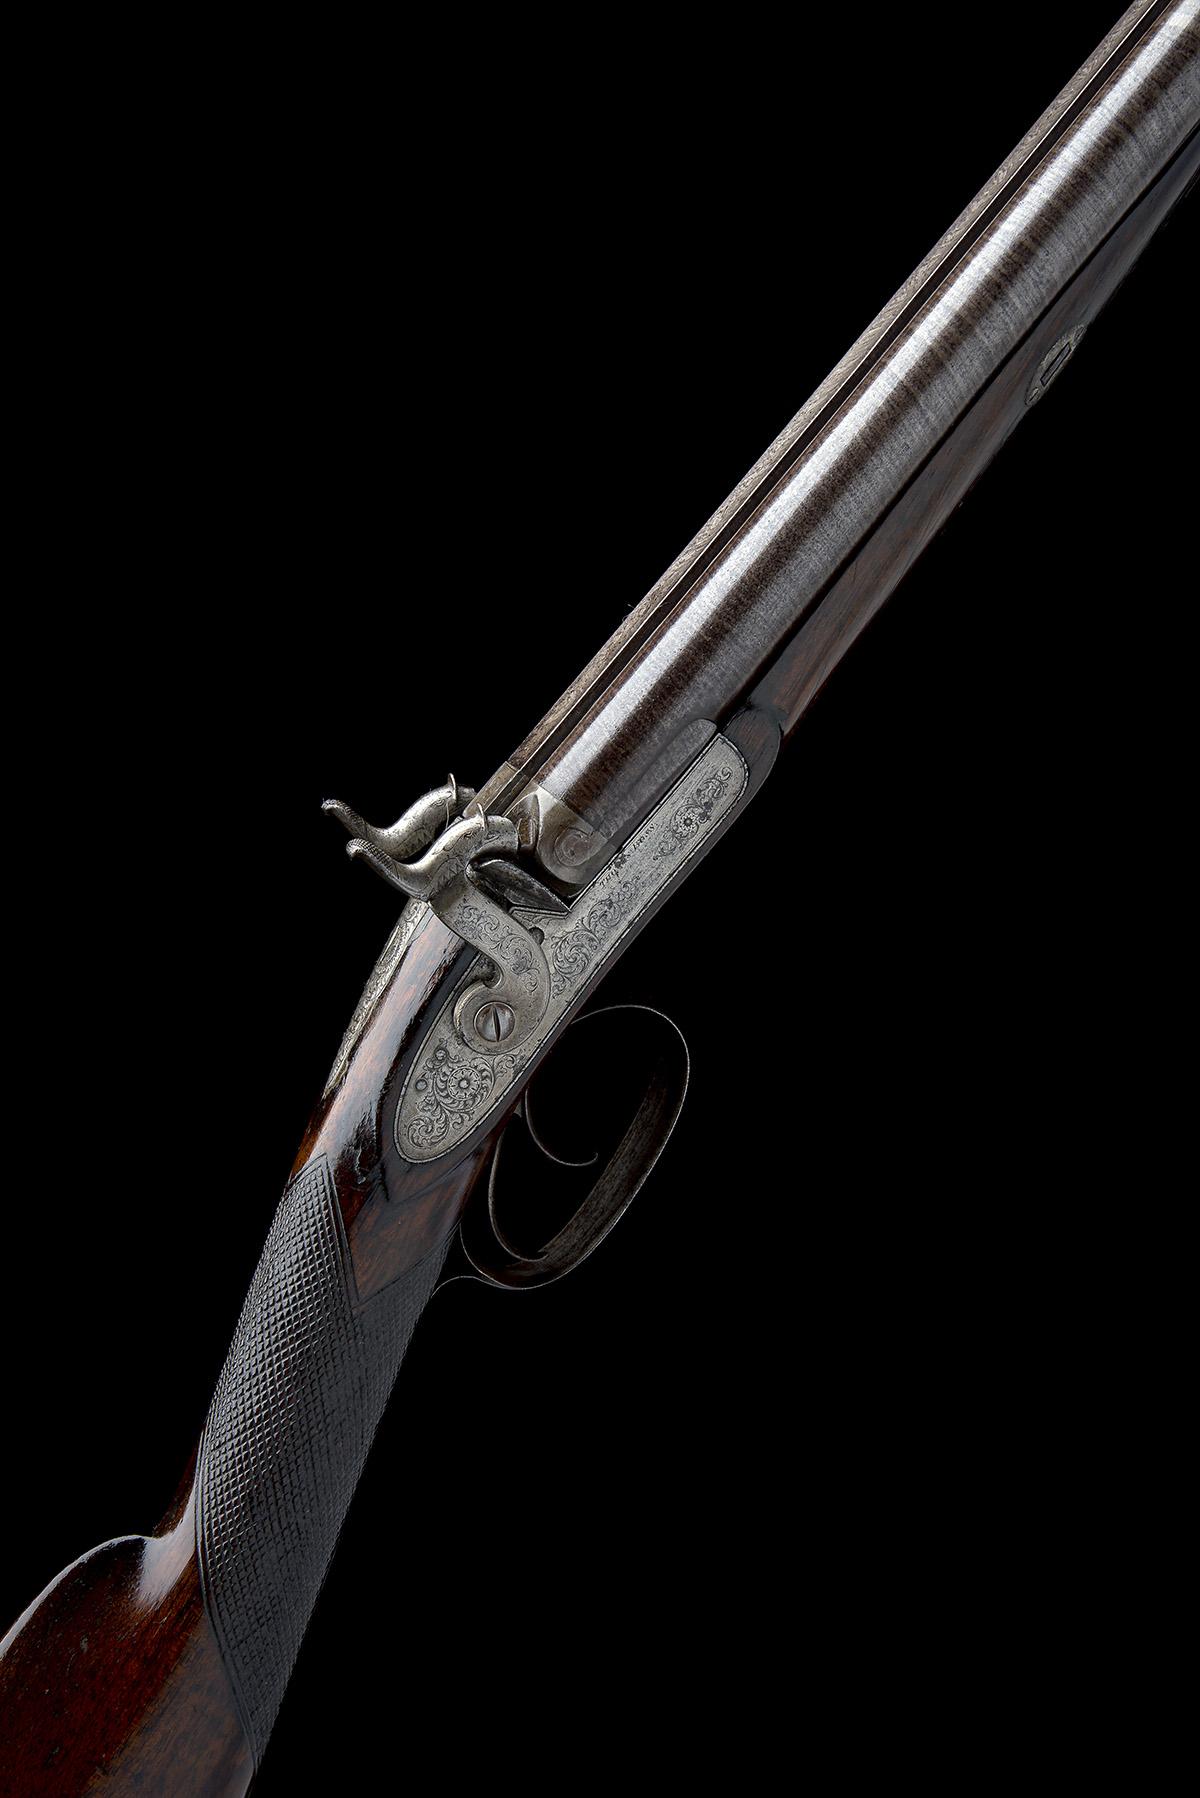 THOMAS BOSS, LONDON A 16-BORE PERCUSSION DOUBLE-BARRELLED SPORTING-GUN, serial no. 605, for 1844,